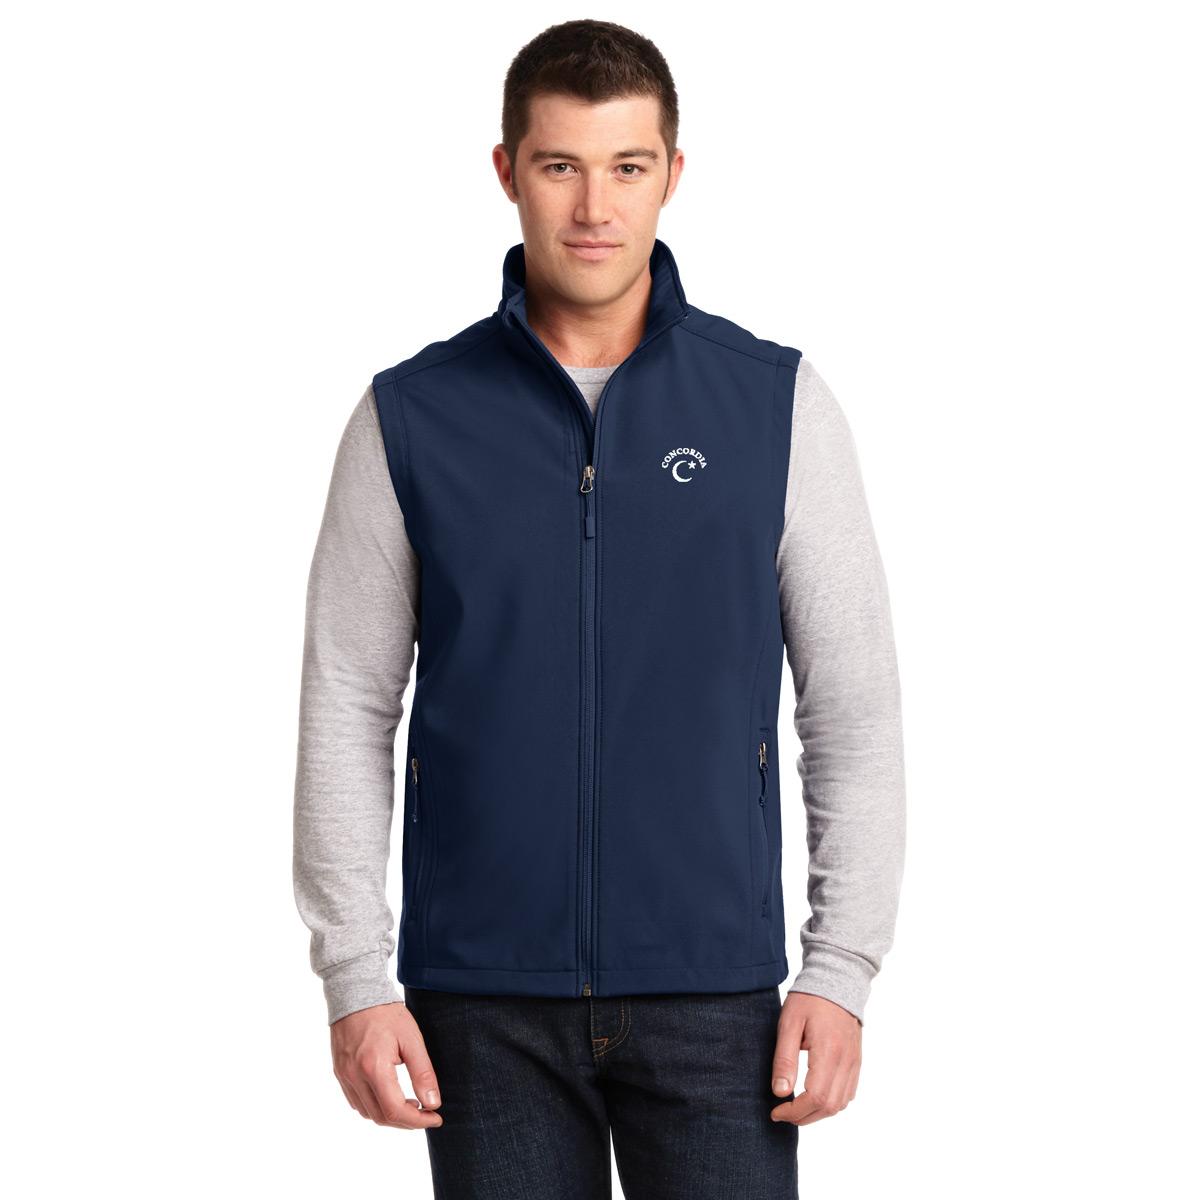 Concordia Yachts - Men's Softshell Vest